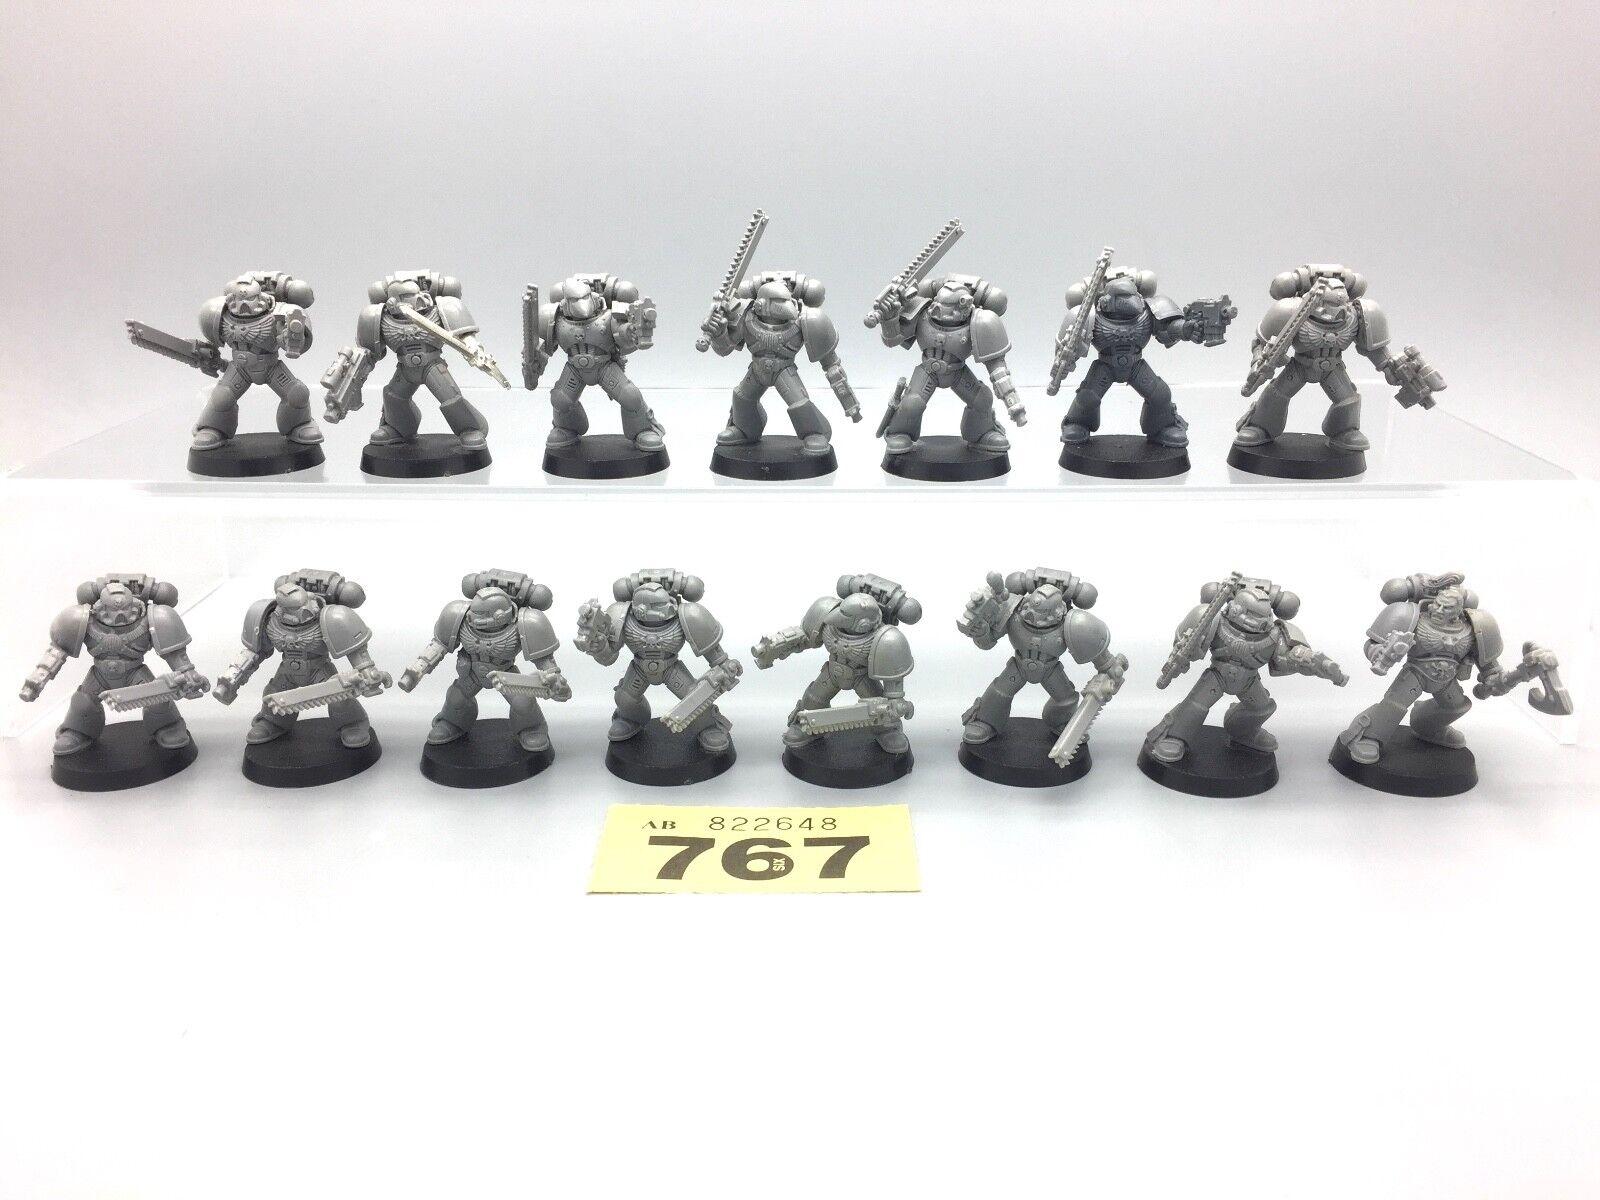 Warhammer 40,000 Espace Marines Adeptus Huguette Assault Marines X 15